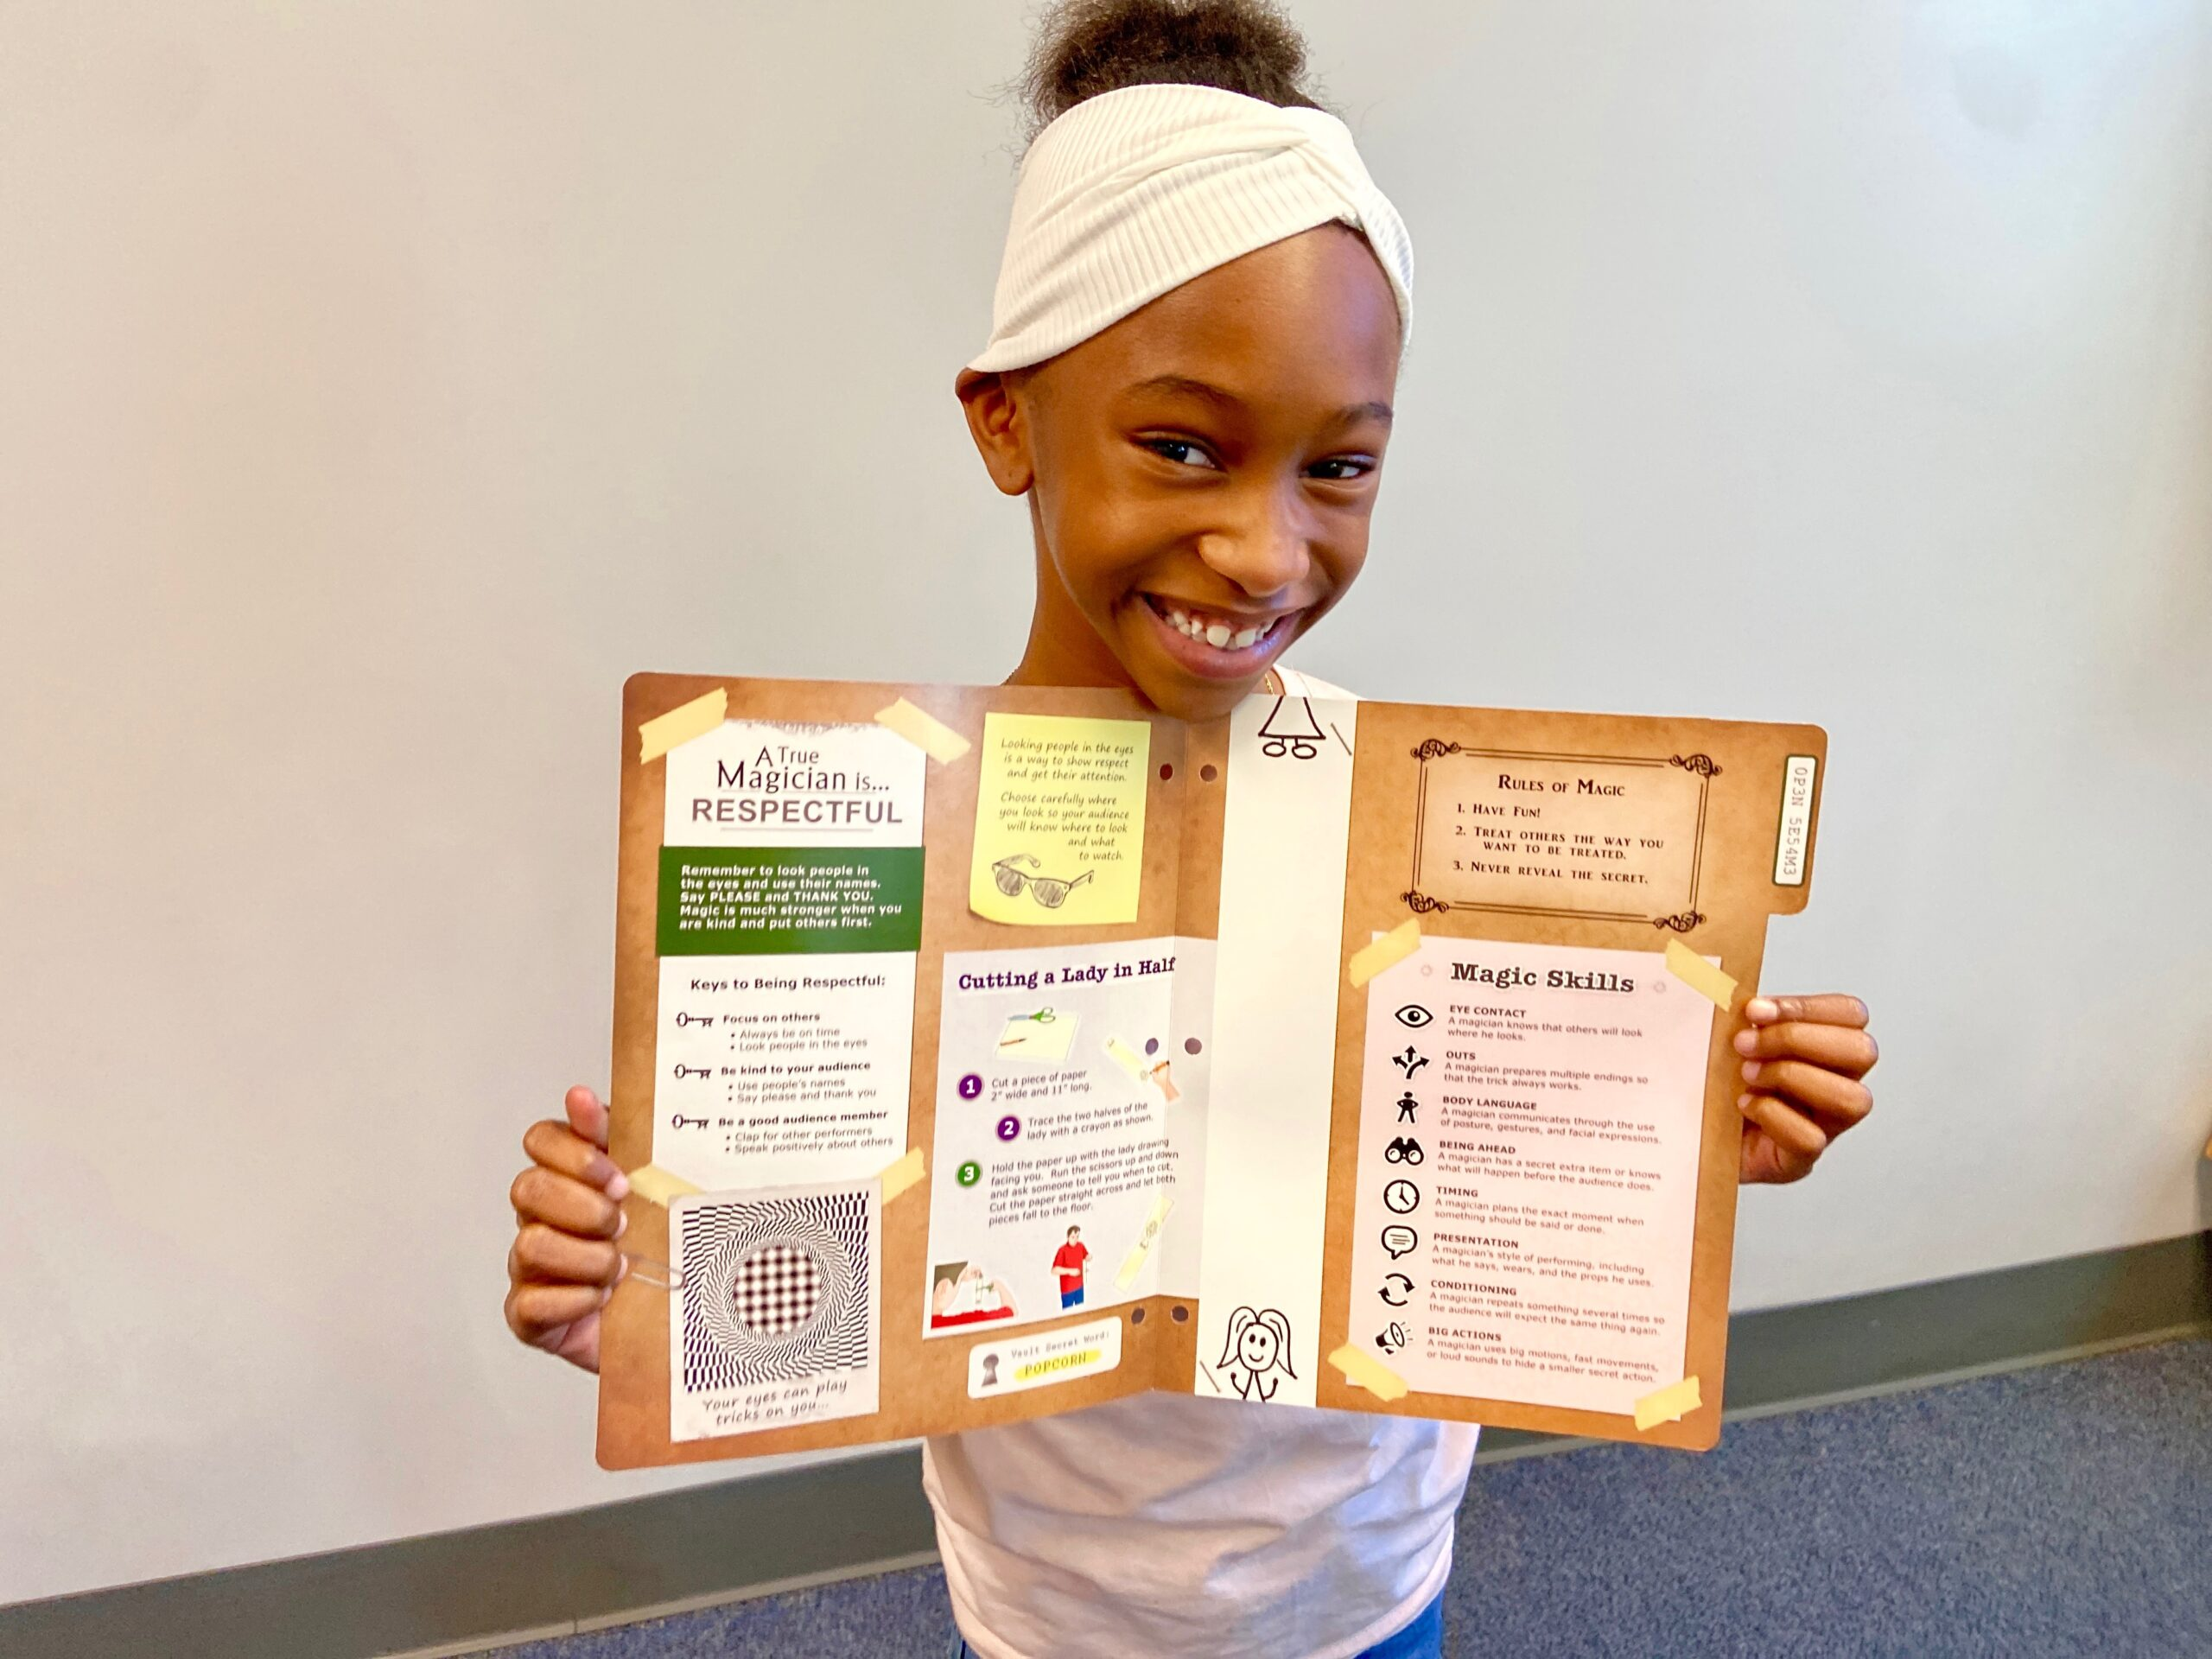 Student shows folder